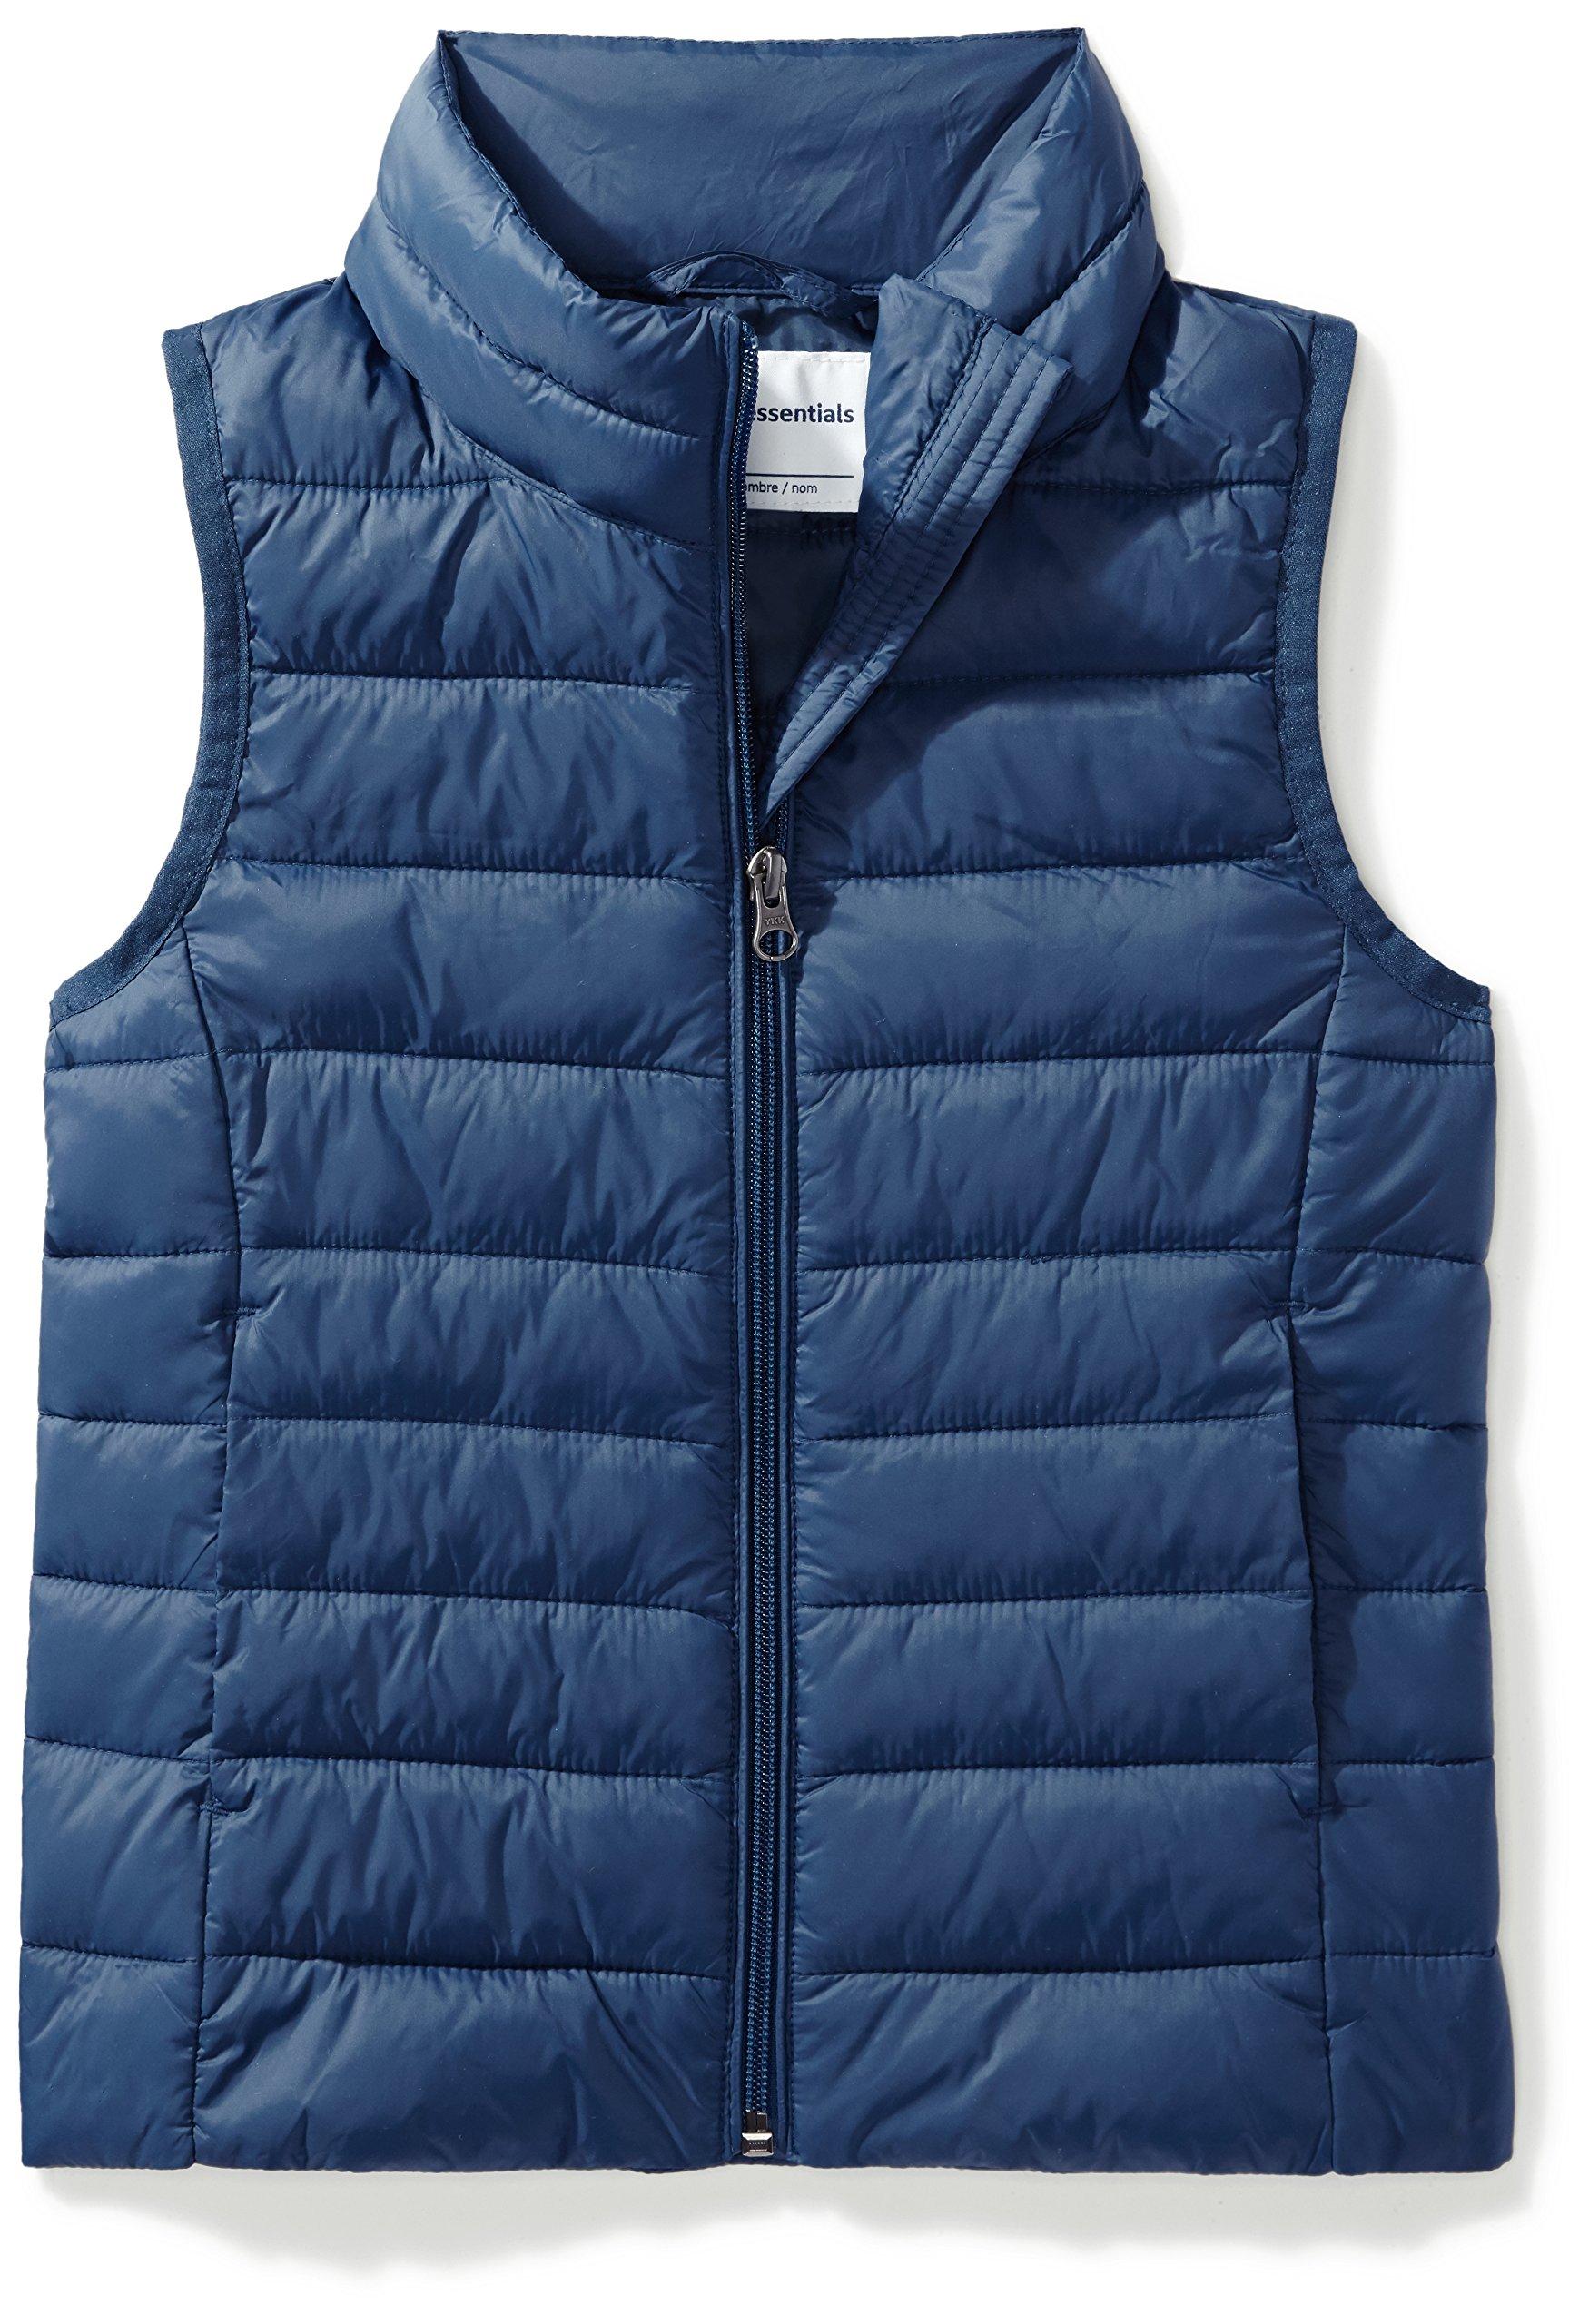 Amazon Essentials Girls' Lightweight Water-Resistant Packable Puffer Vest, Navy, Medium